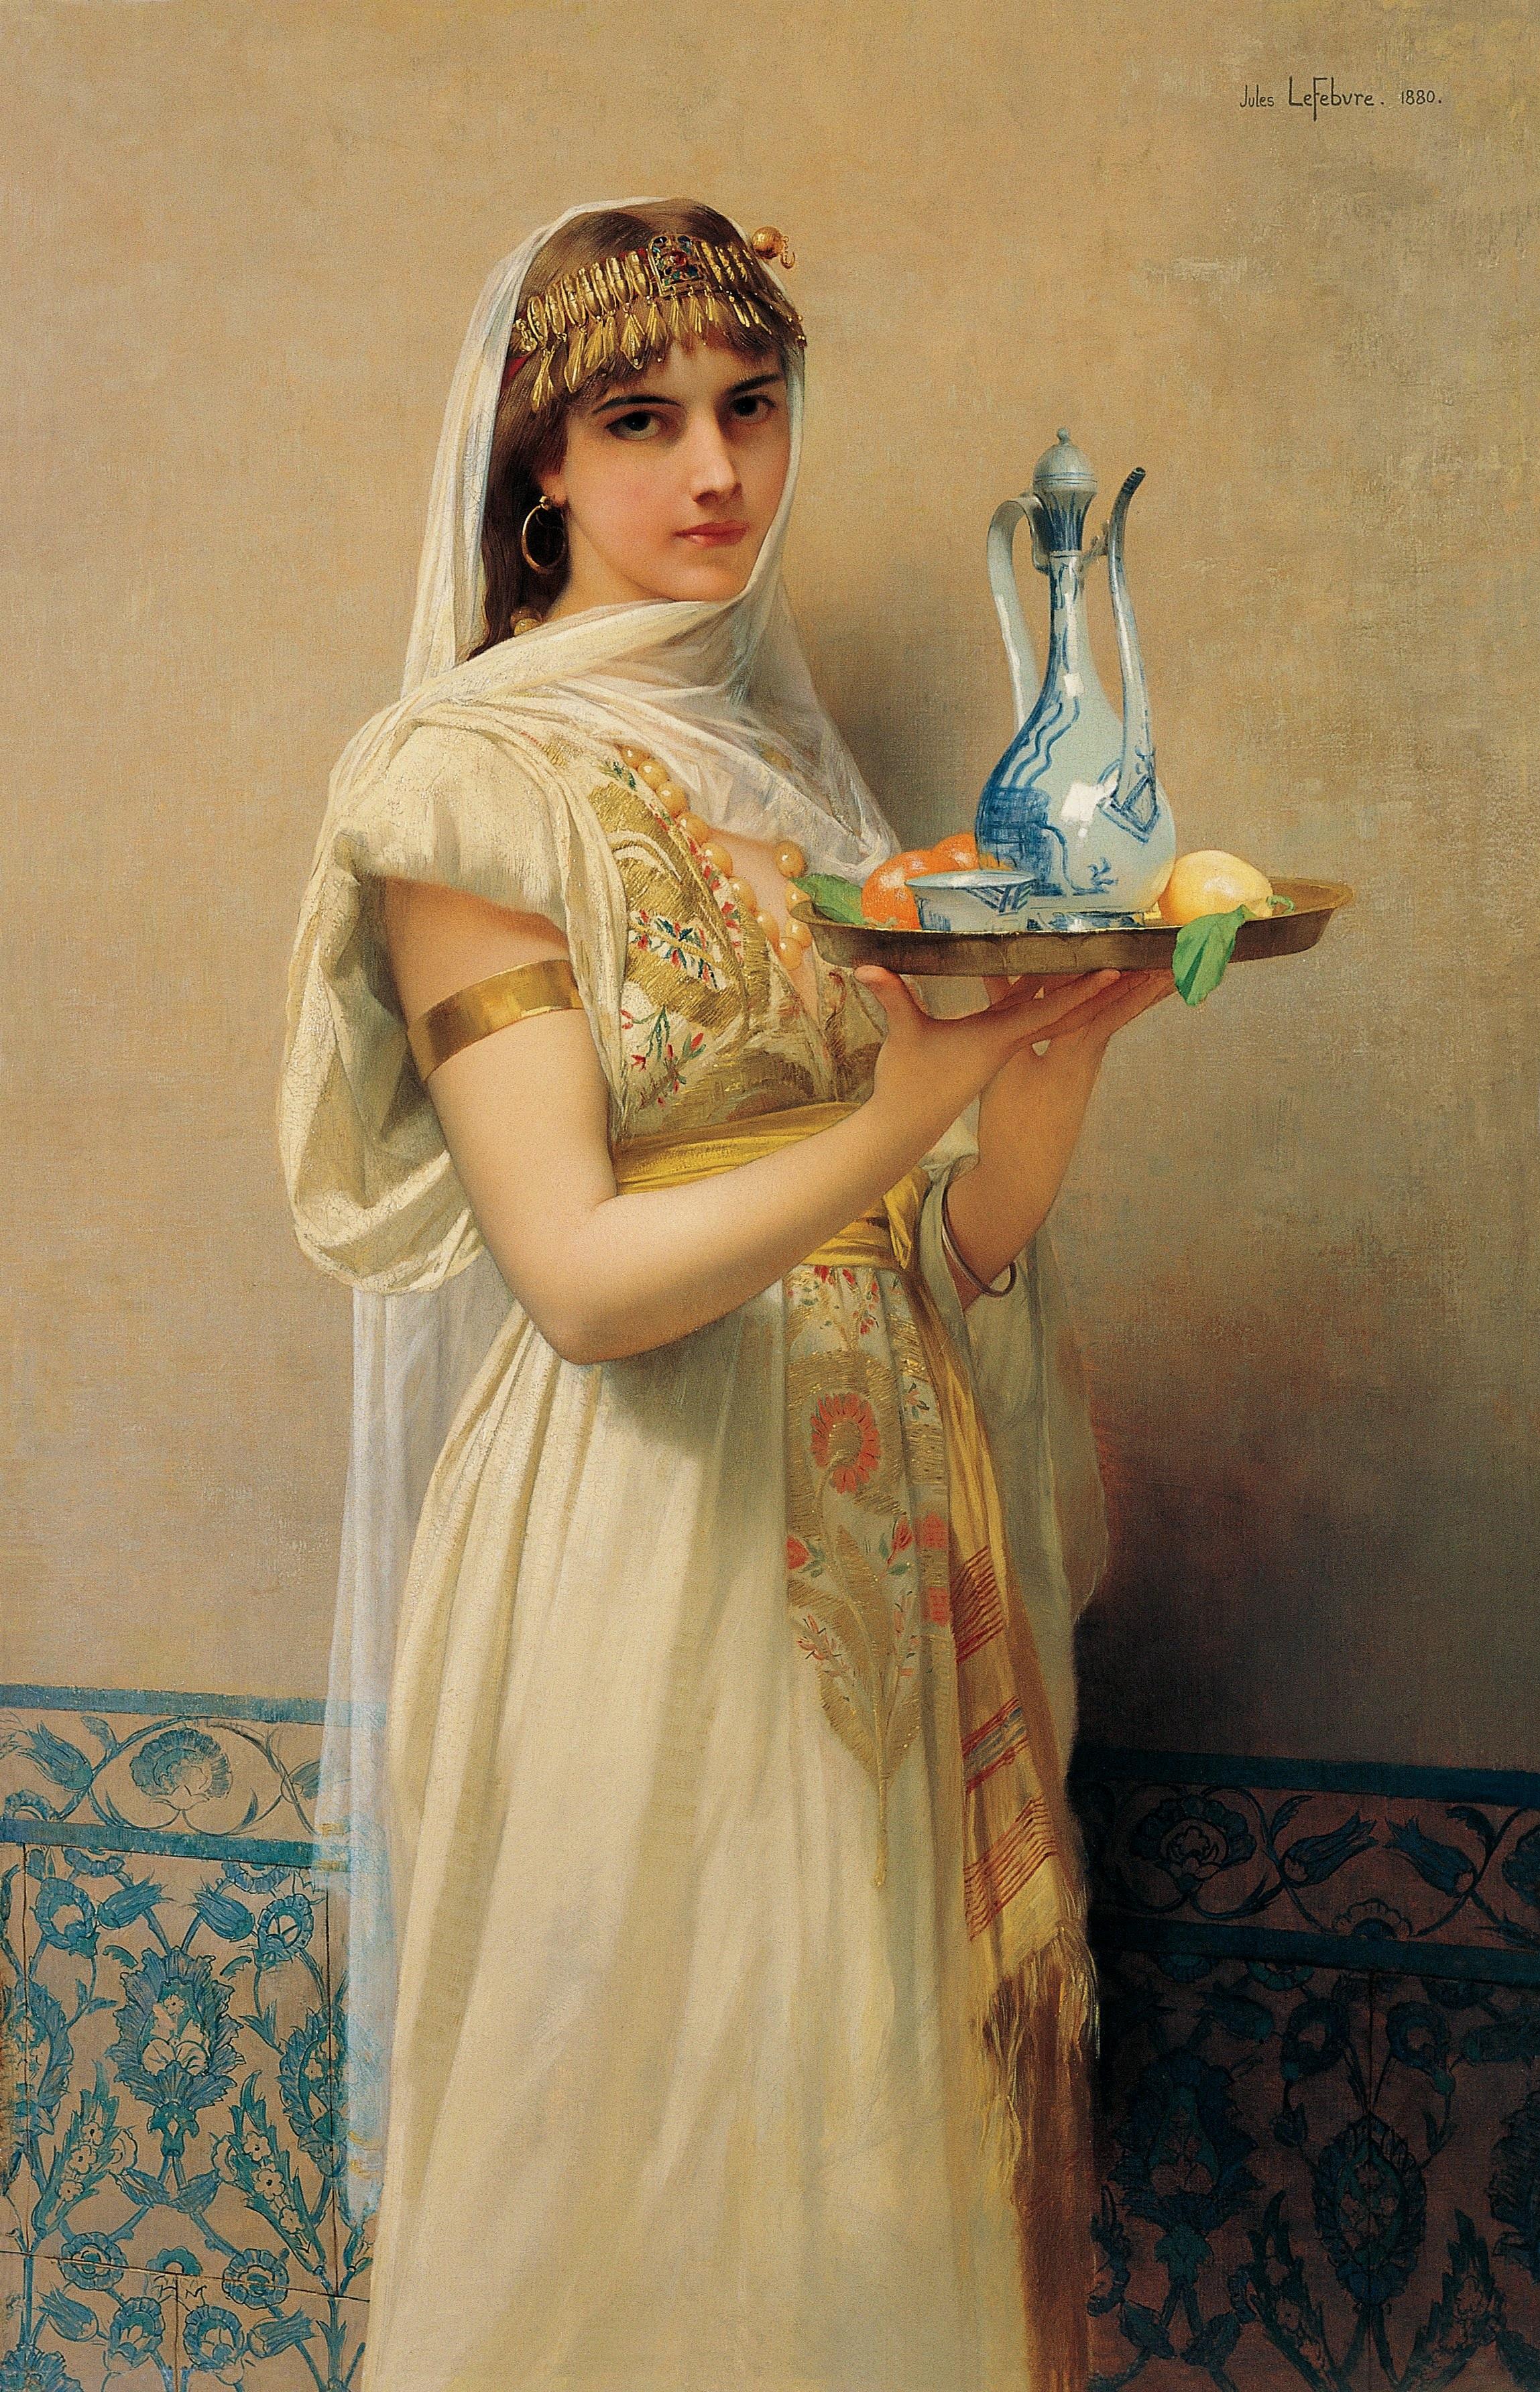 https://upload.wikimedia.org/wikipedia/commons/0/05/JULES_LEFEBVRE_-_Sirvienta_(Pera_Museum,_fin._s._XIX._%C3%93leo_sobre_lienzo,_128_x_82.5_cm).jpg